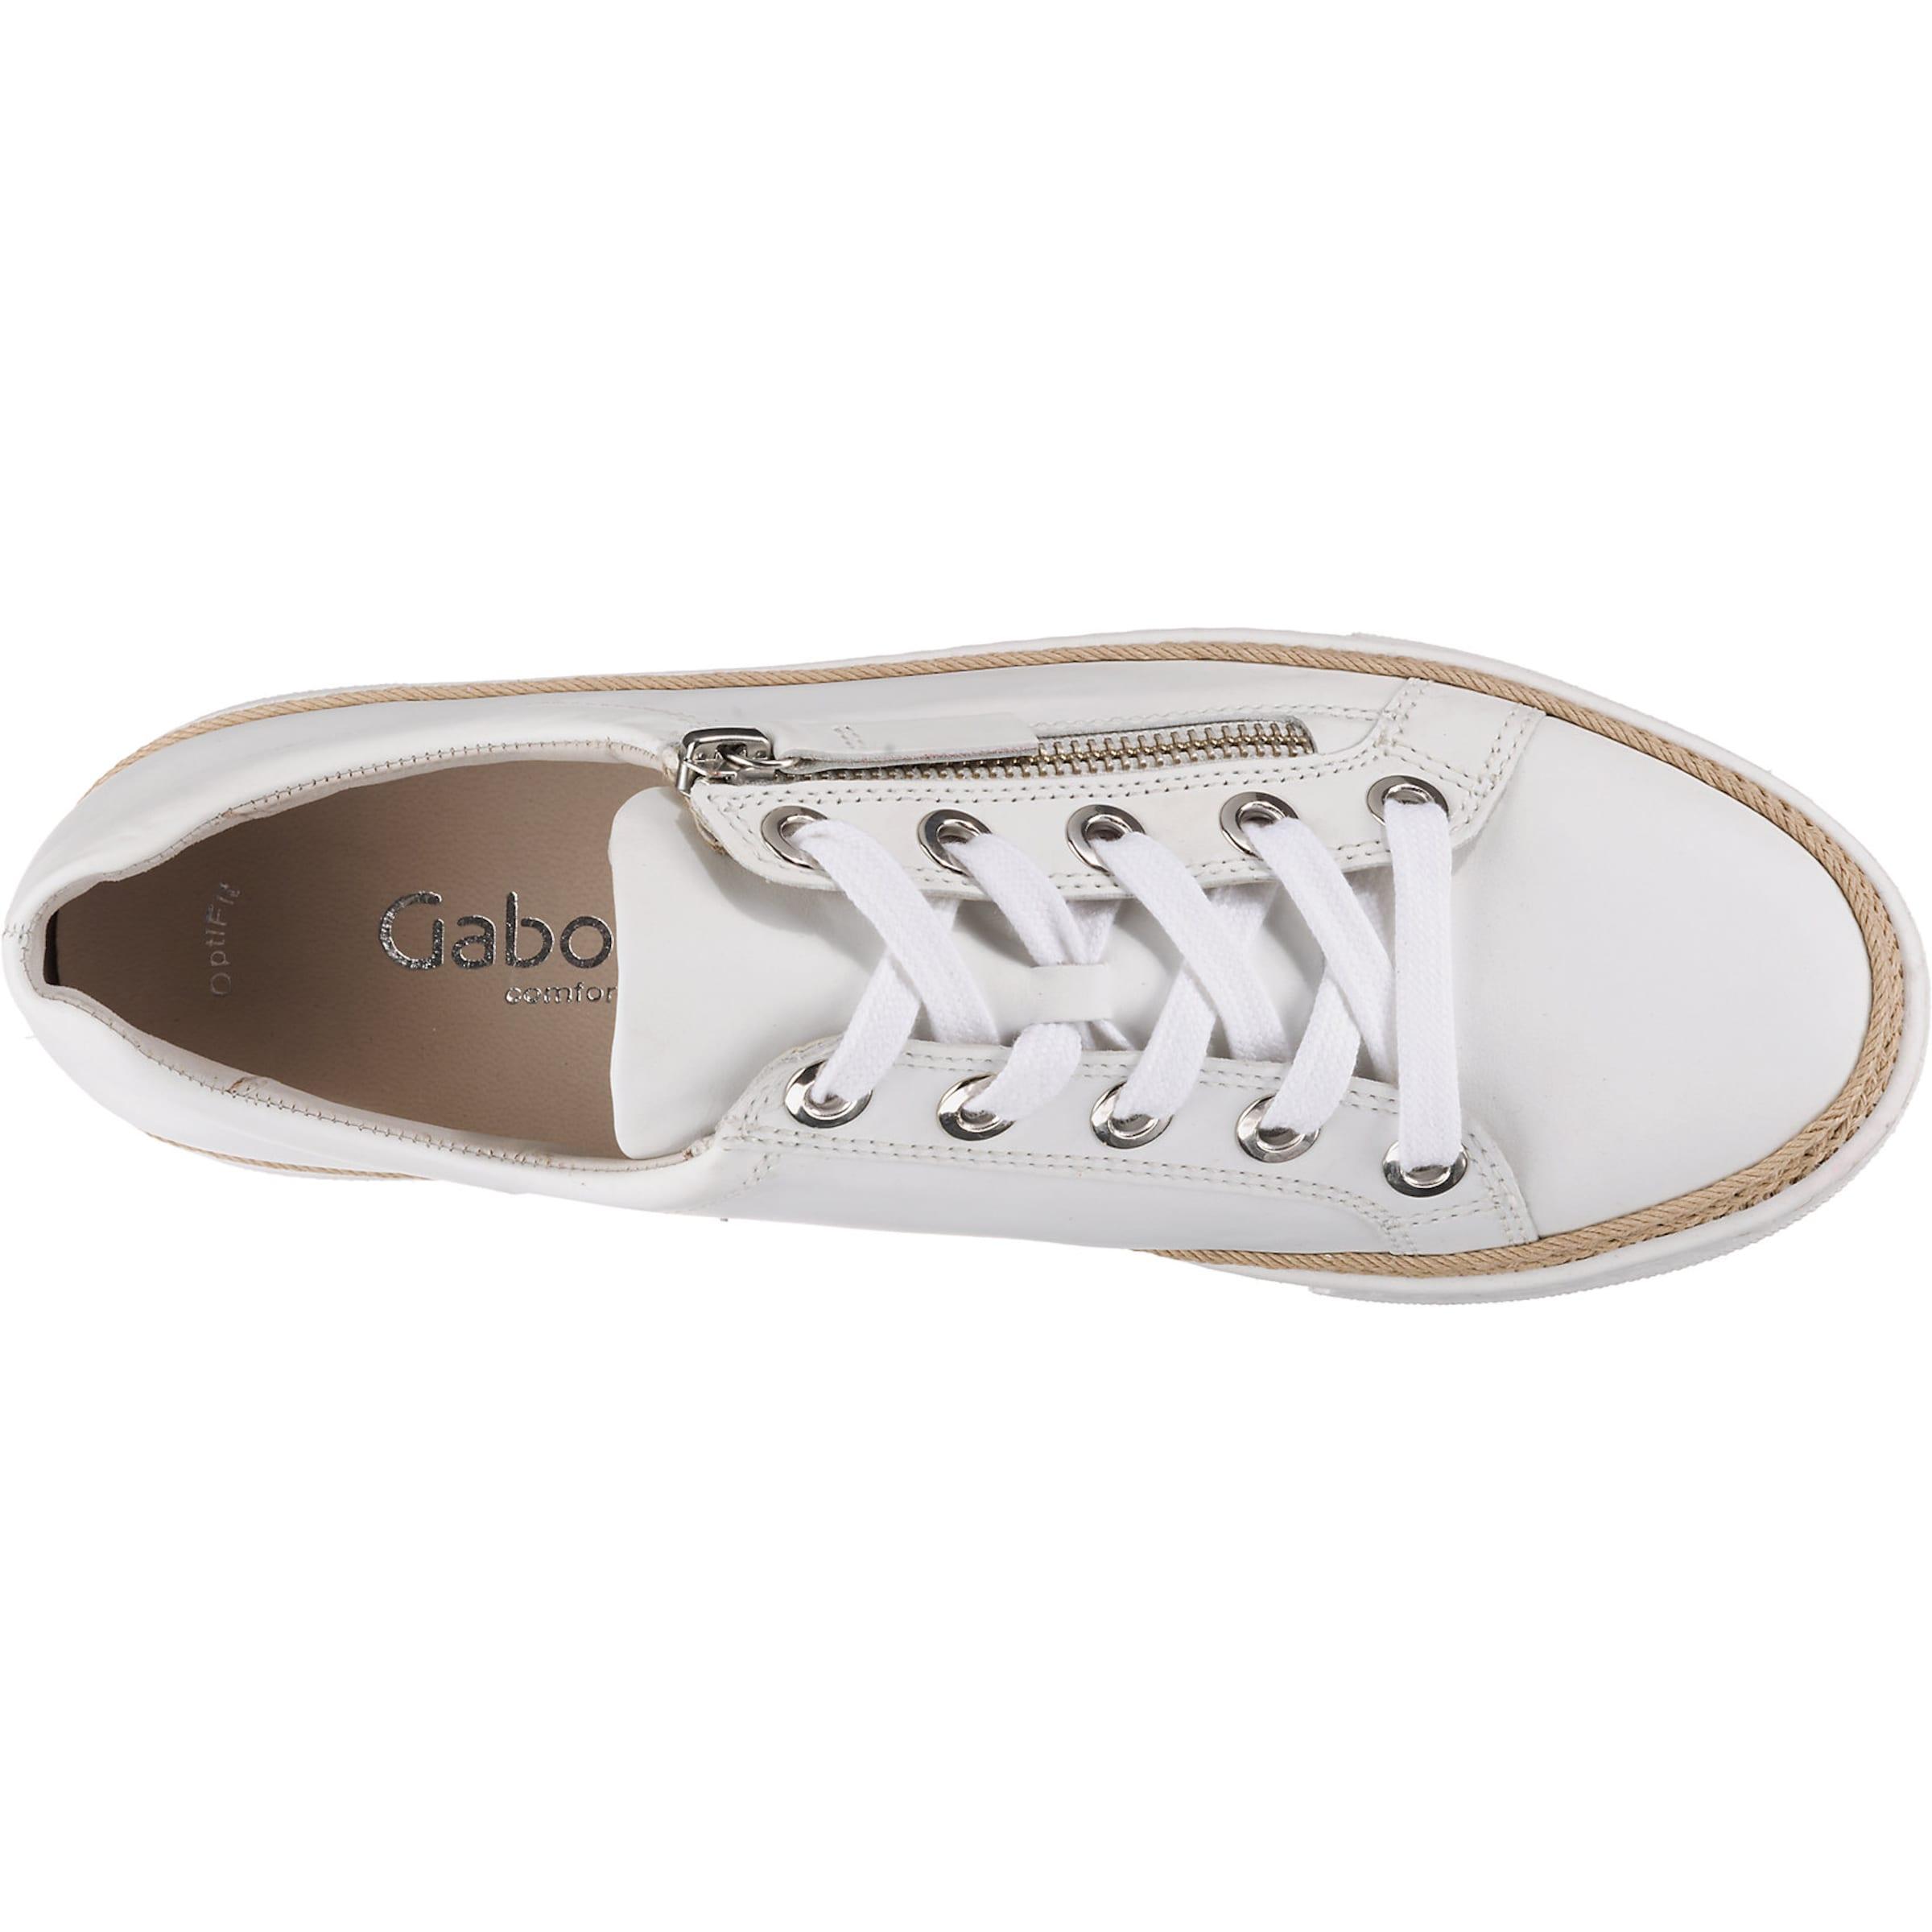 Gabor Gabor In Weiß Sneaker Gabor In Weiß Weiß Gabor Sneaker Sneaker In O8wnk0P